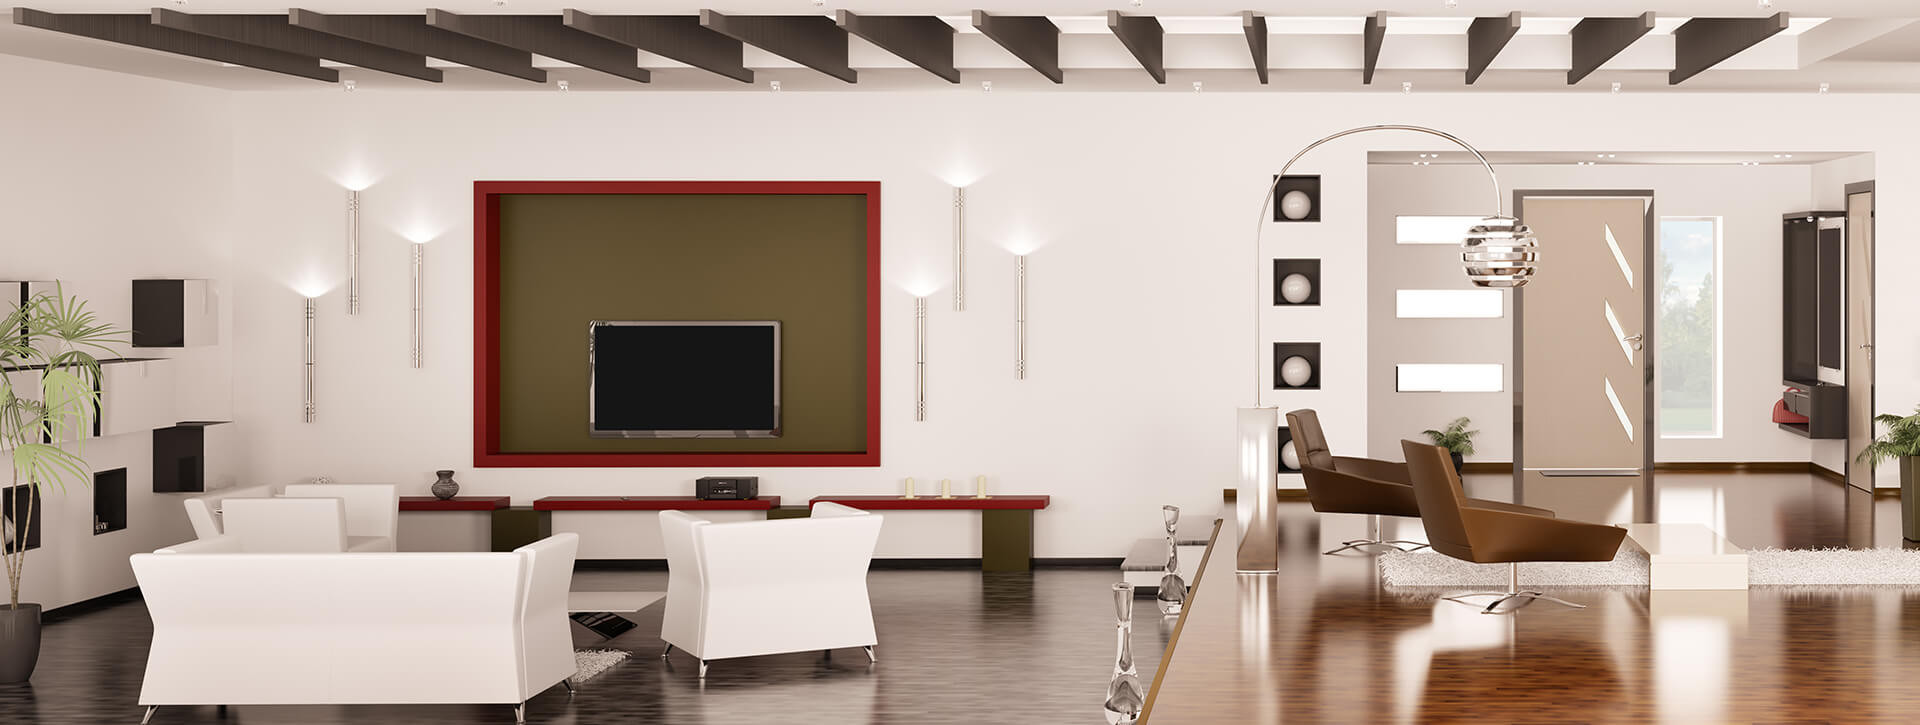 hardwood floor refinishing regina of flooring regina hardwood engineered laminate lvt tiles more throughout slide 3